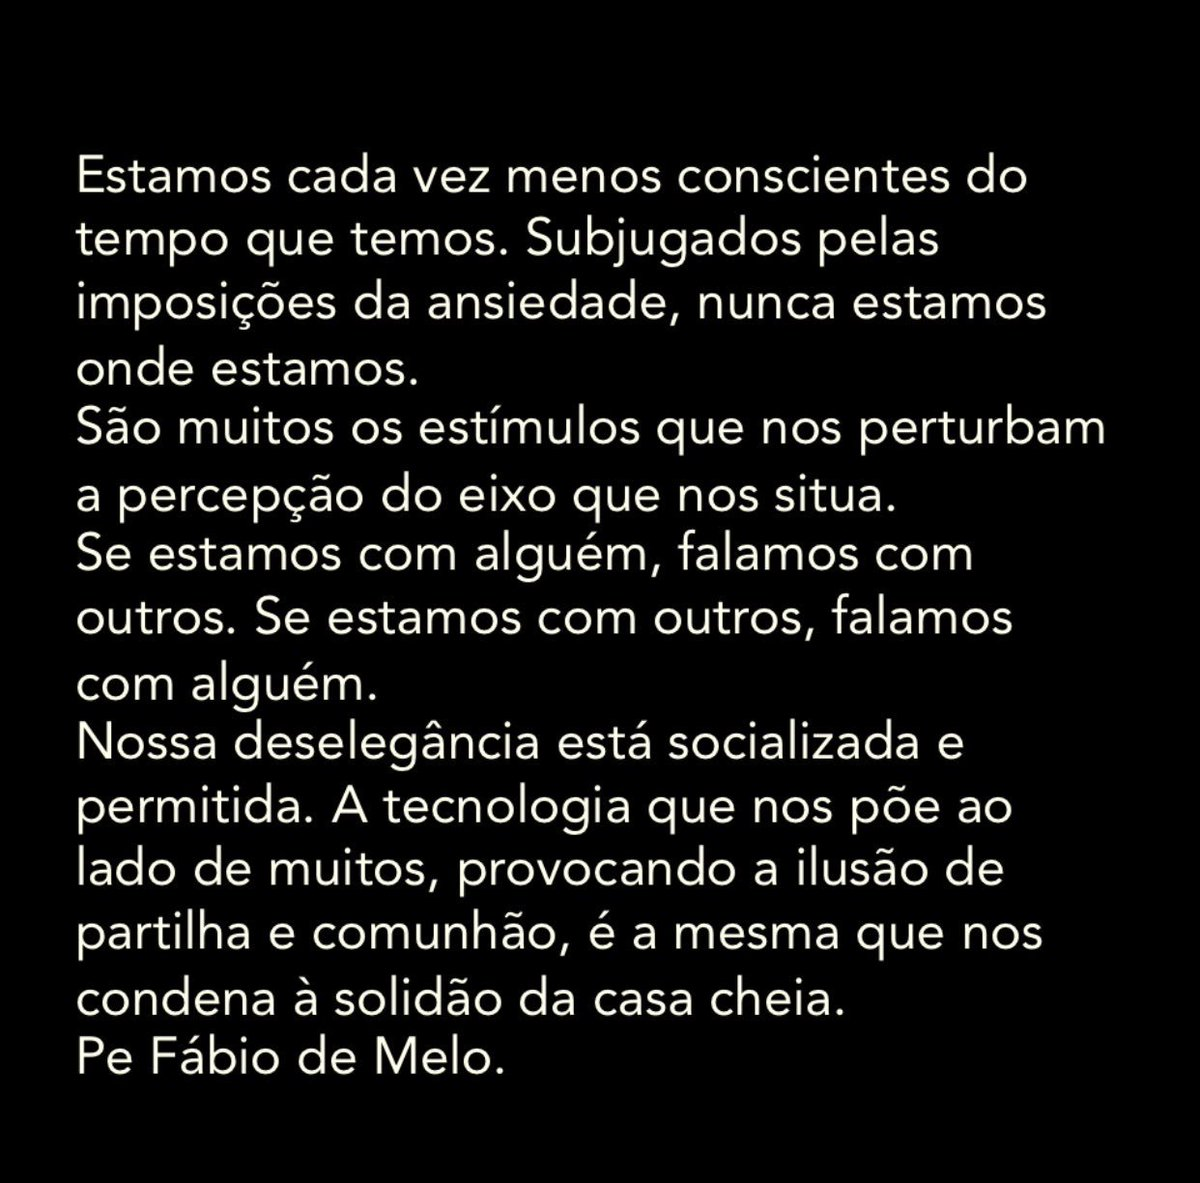 padrefabiodemelo (@pefabiodemelo) | Twitter